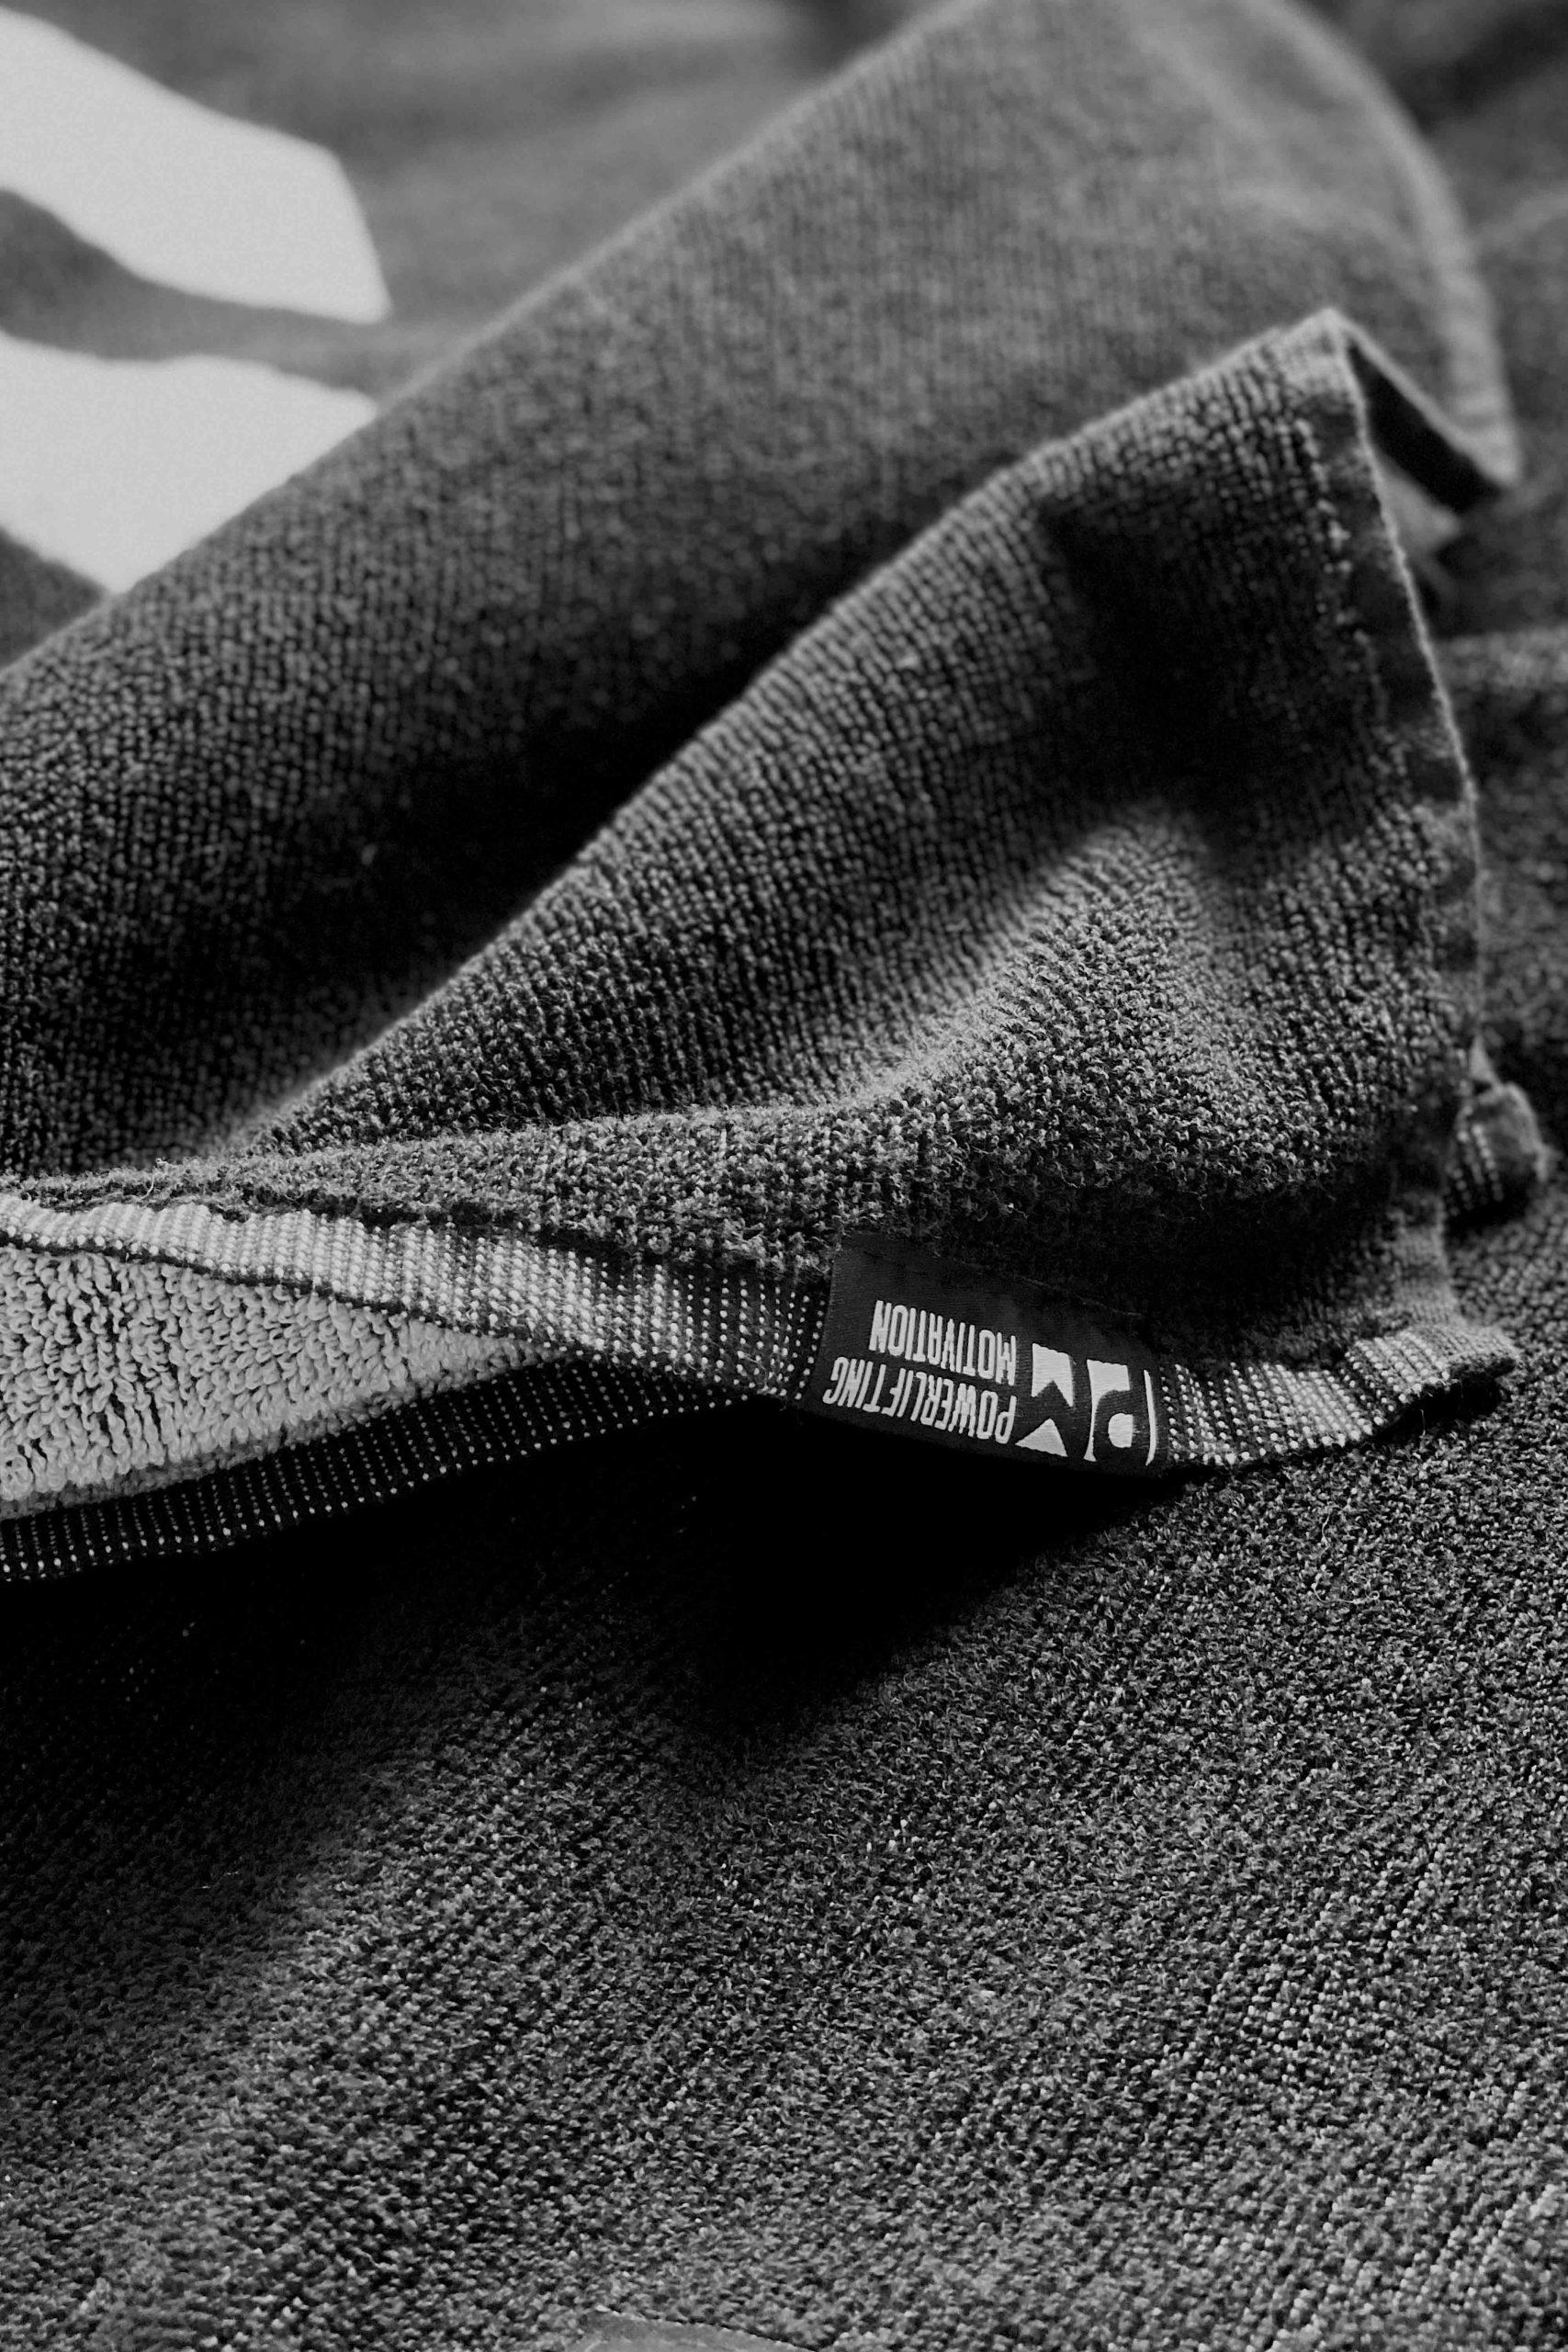 PM big towel details 2